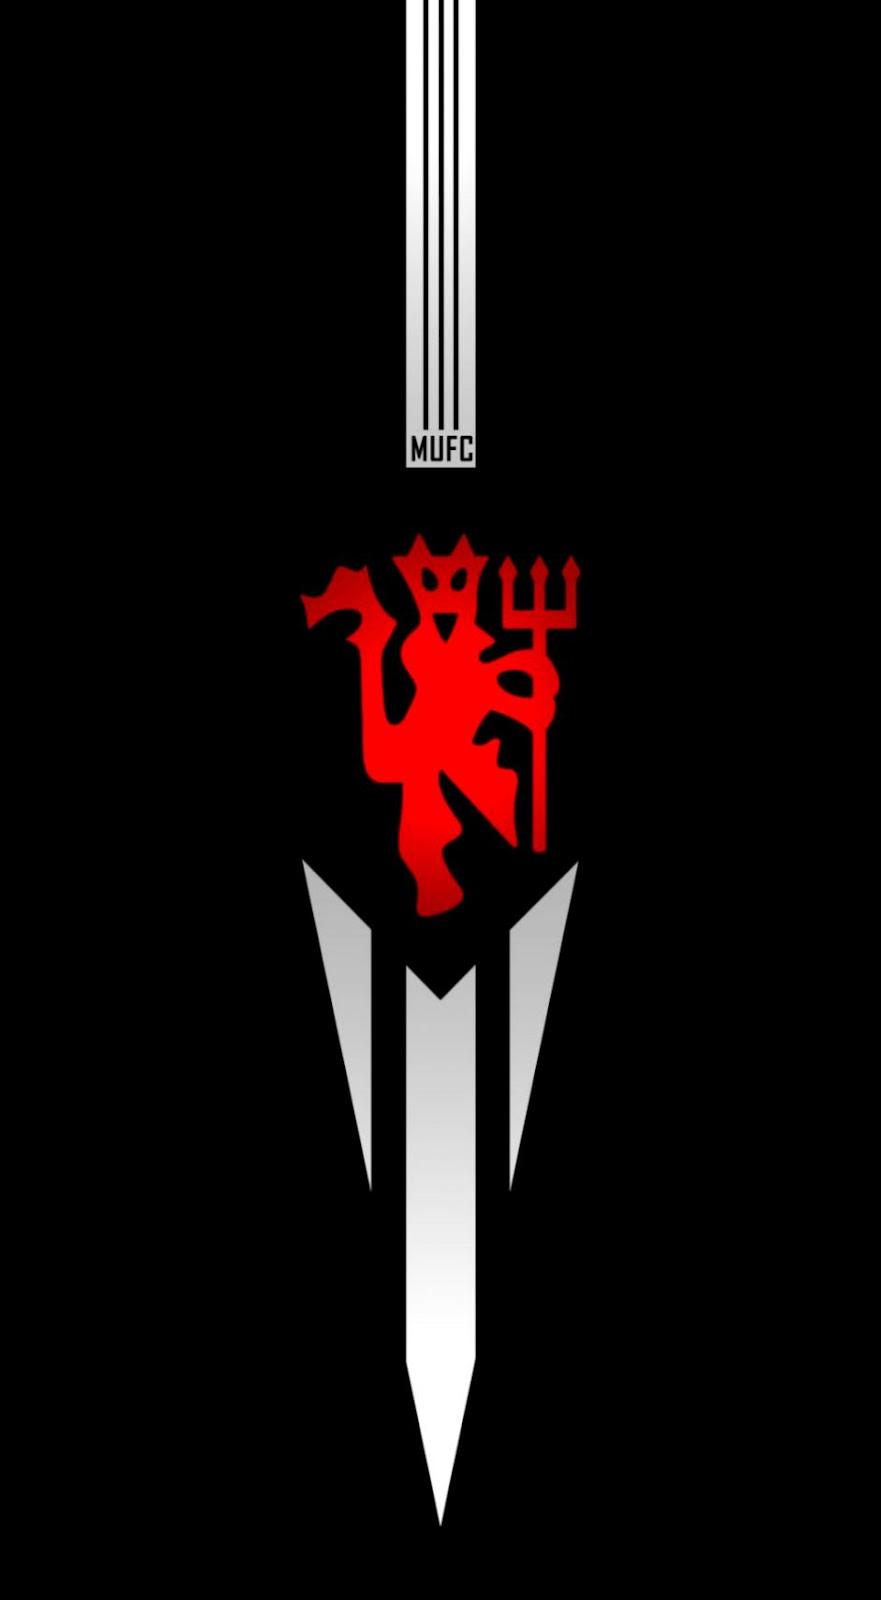 Manchester United Hd Logo Backgrounds Desktop Pixell Wallpapers